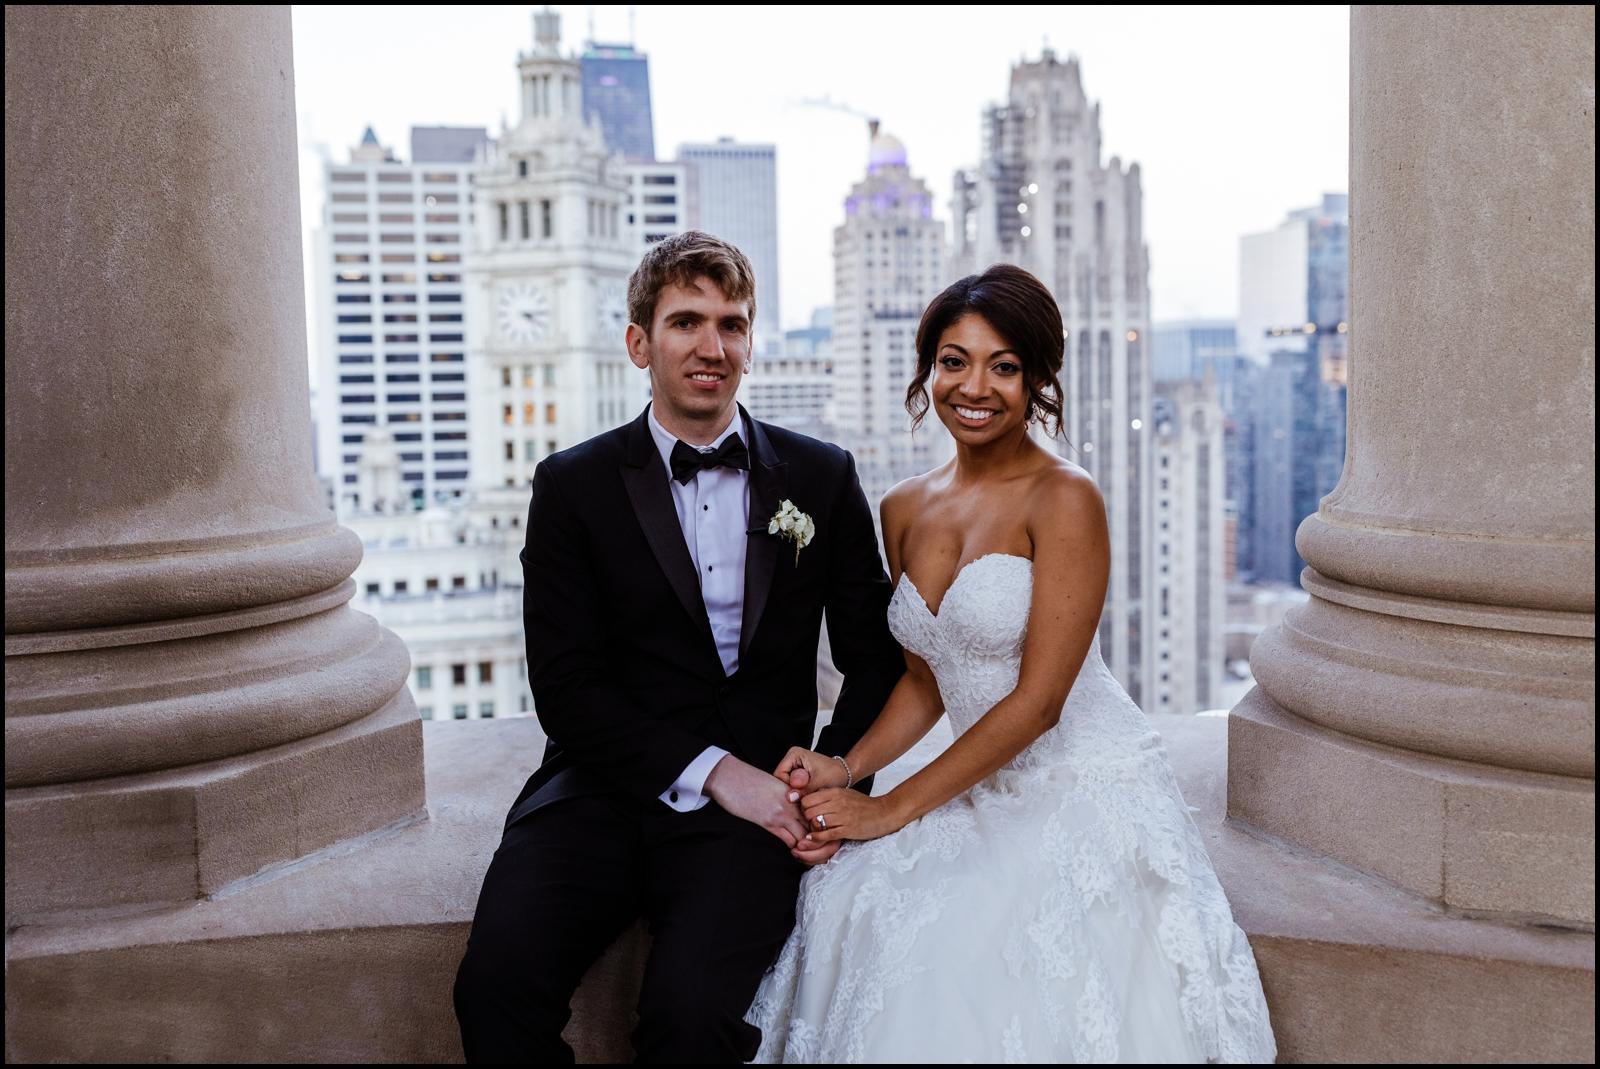 Chicago Wedding- Alice Millar Chapel Ceremony, London House Reception_0105.jpg